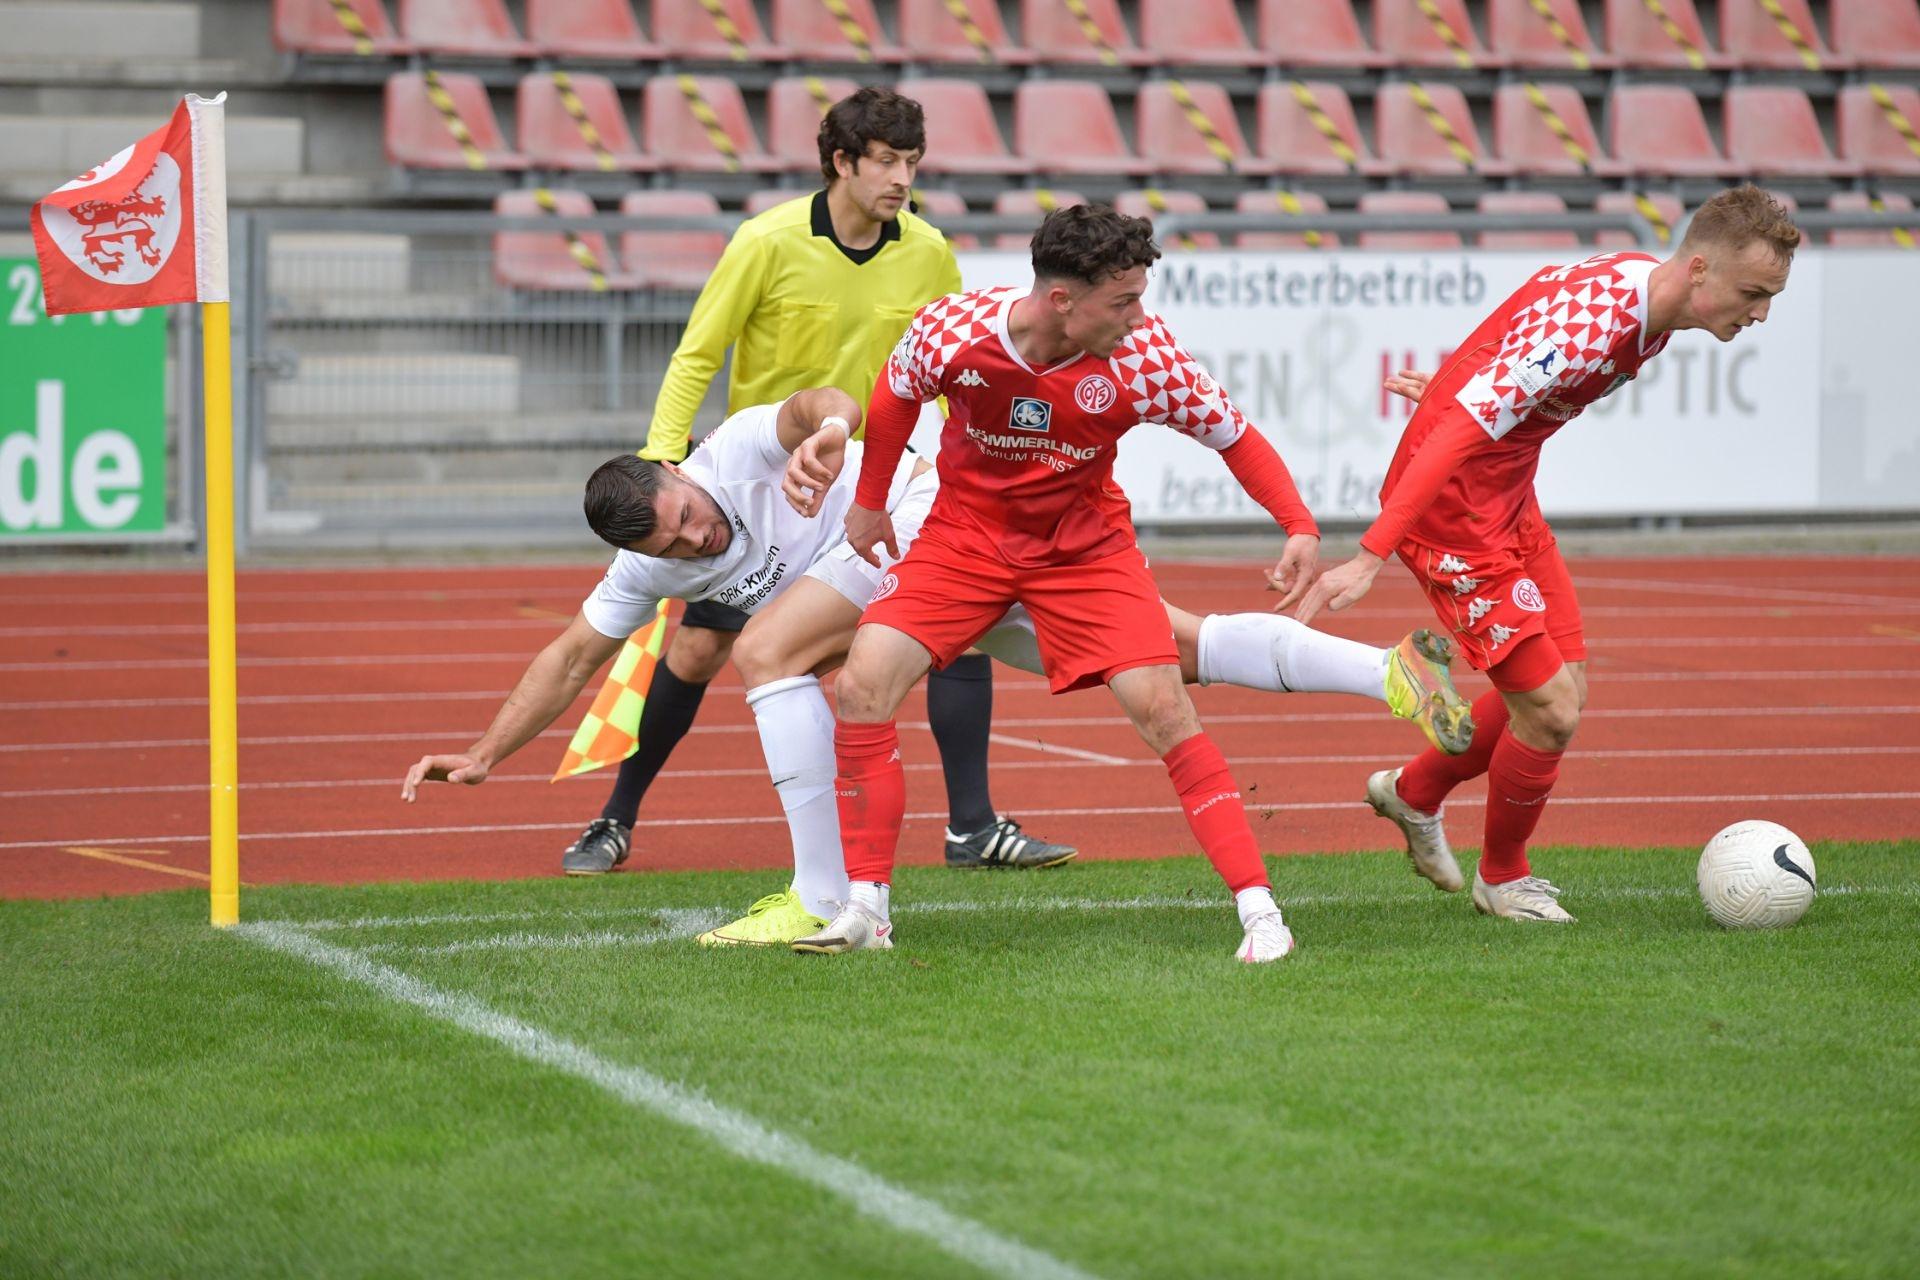 Regionalliga S�dwest 2020/21, KSV Hessen Kassel, 1. FSV Mainz 05 II, Endstand 2:1